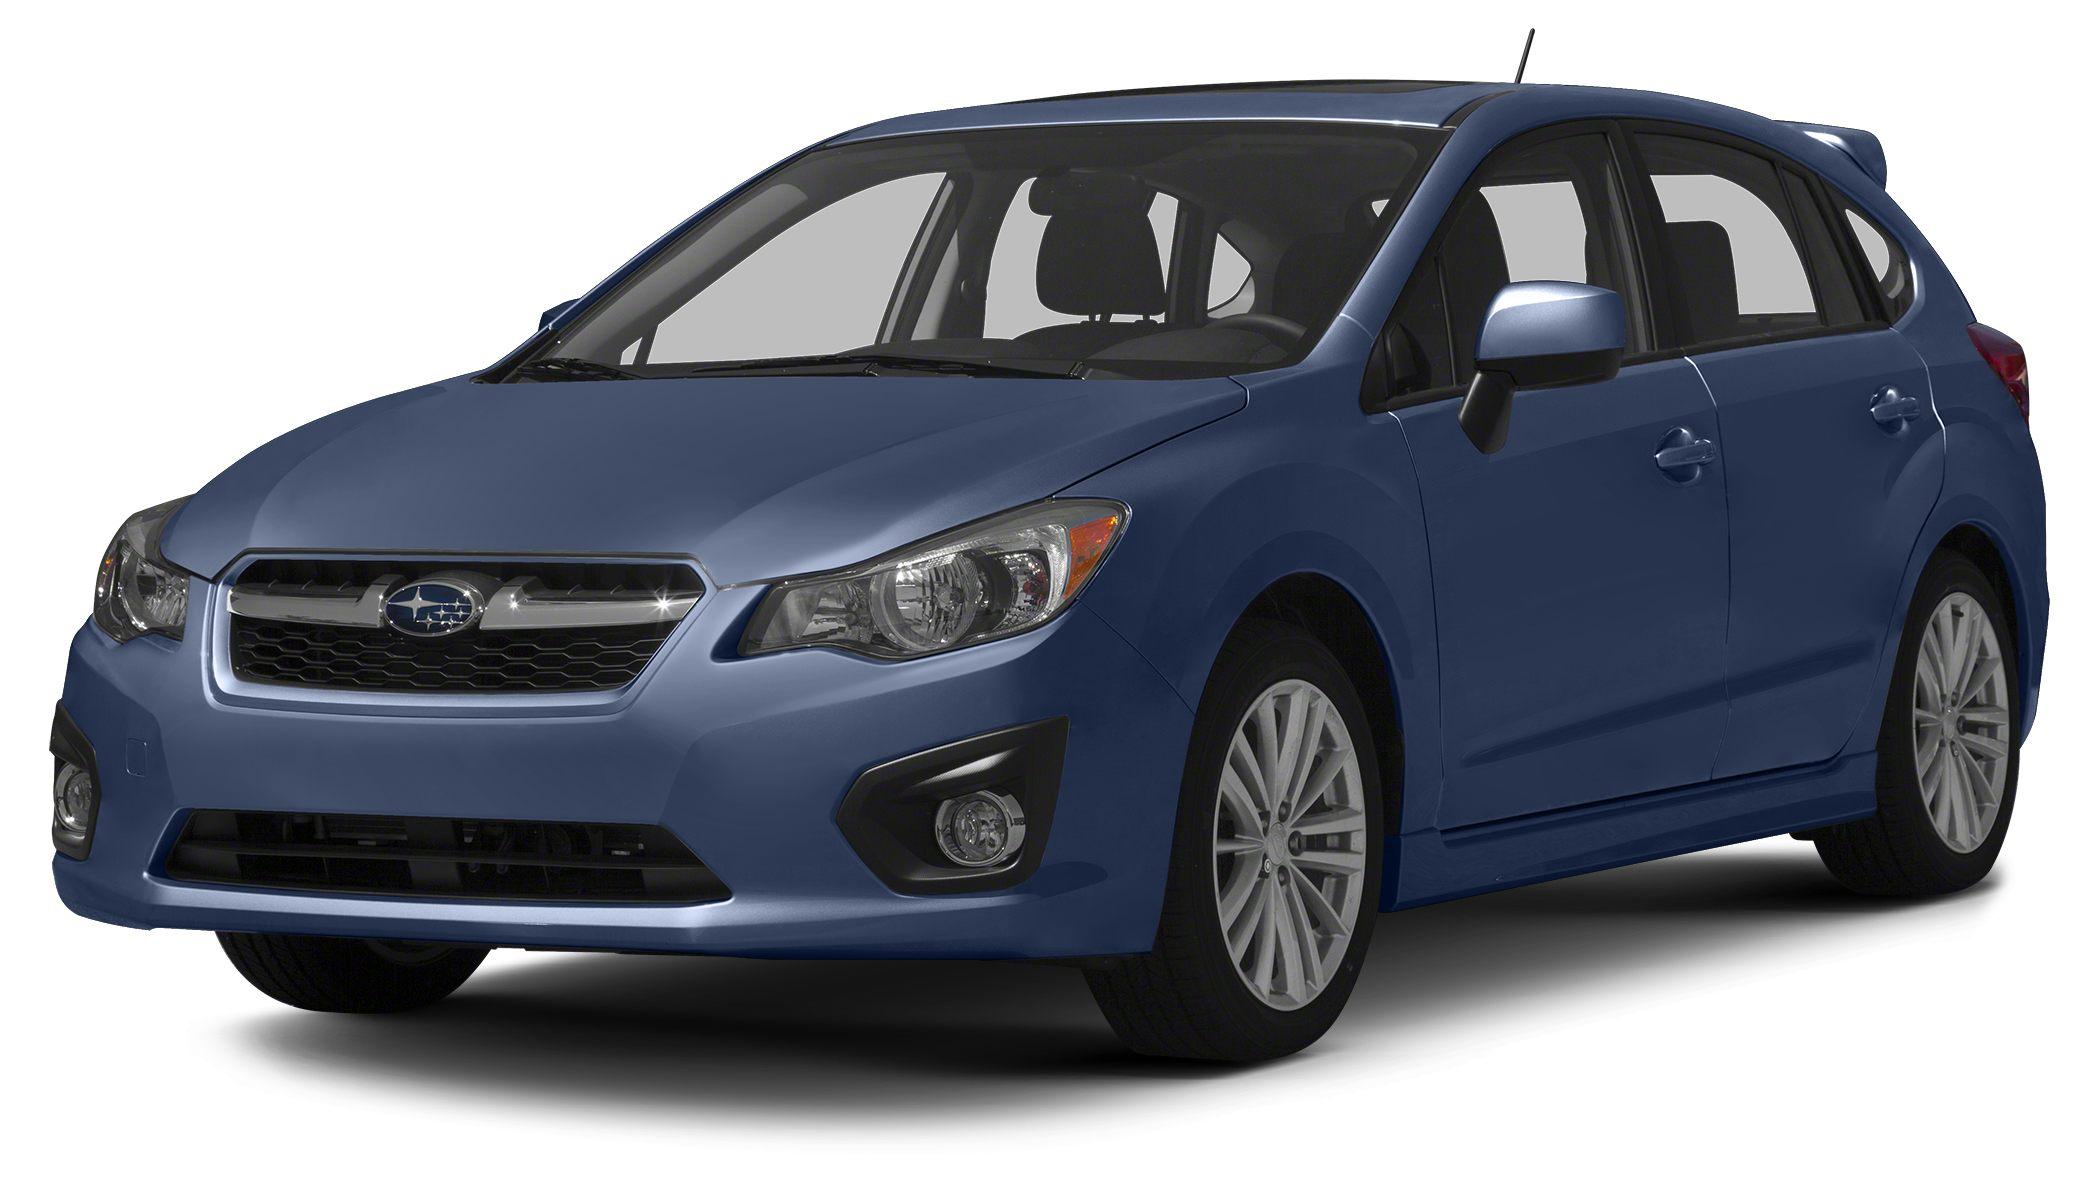 2013 Subaru Impreza 20i CARFAX 1-Owner 12000 Mile Warranty 20i trim FUEL EFFICIENT 33 MPG Hw